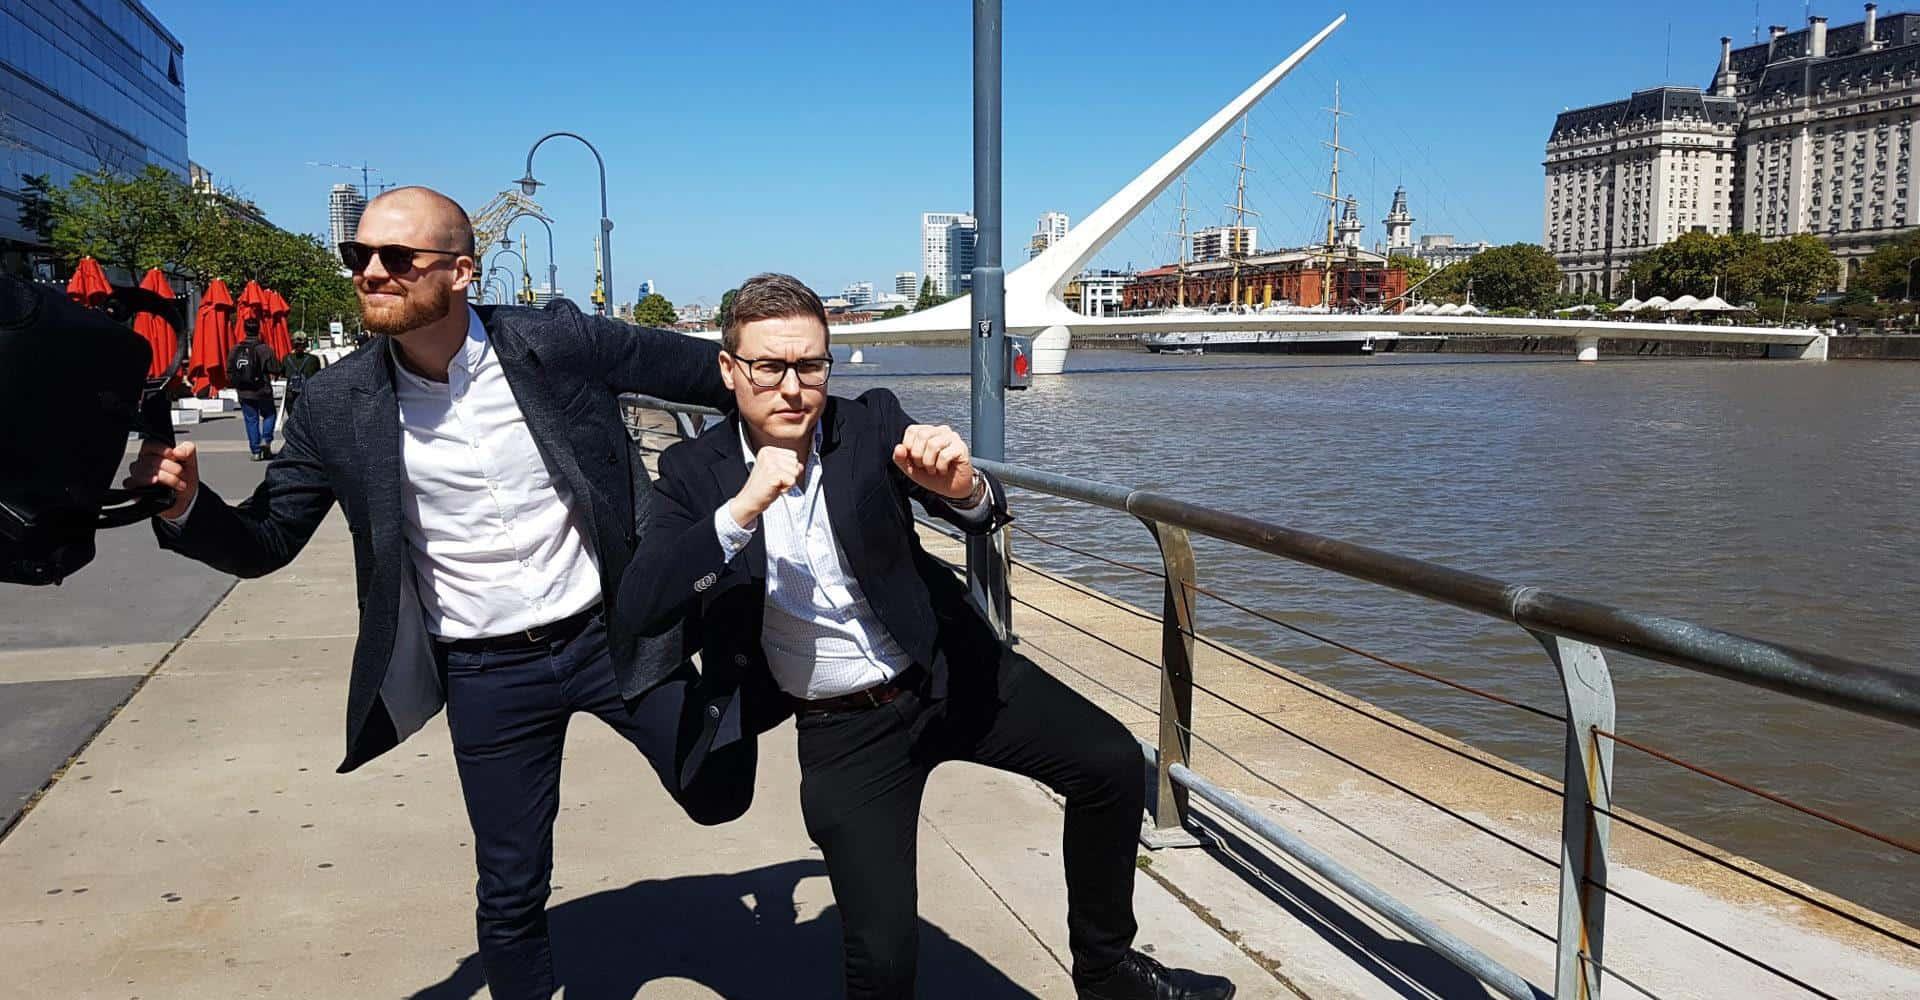 Esa-Matti Karine and Jussi Toivonen posing outdoors